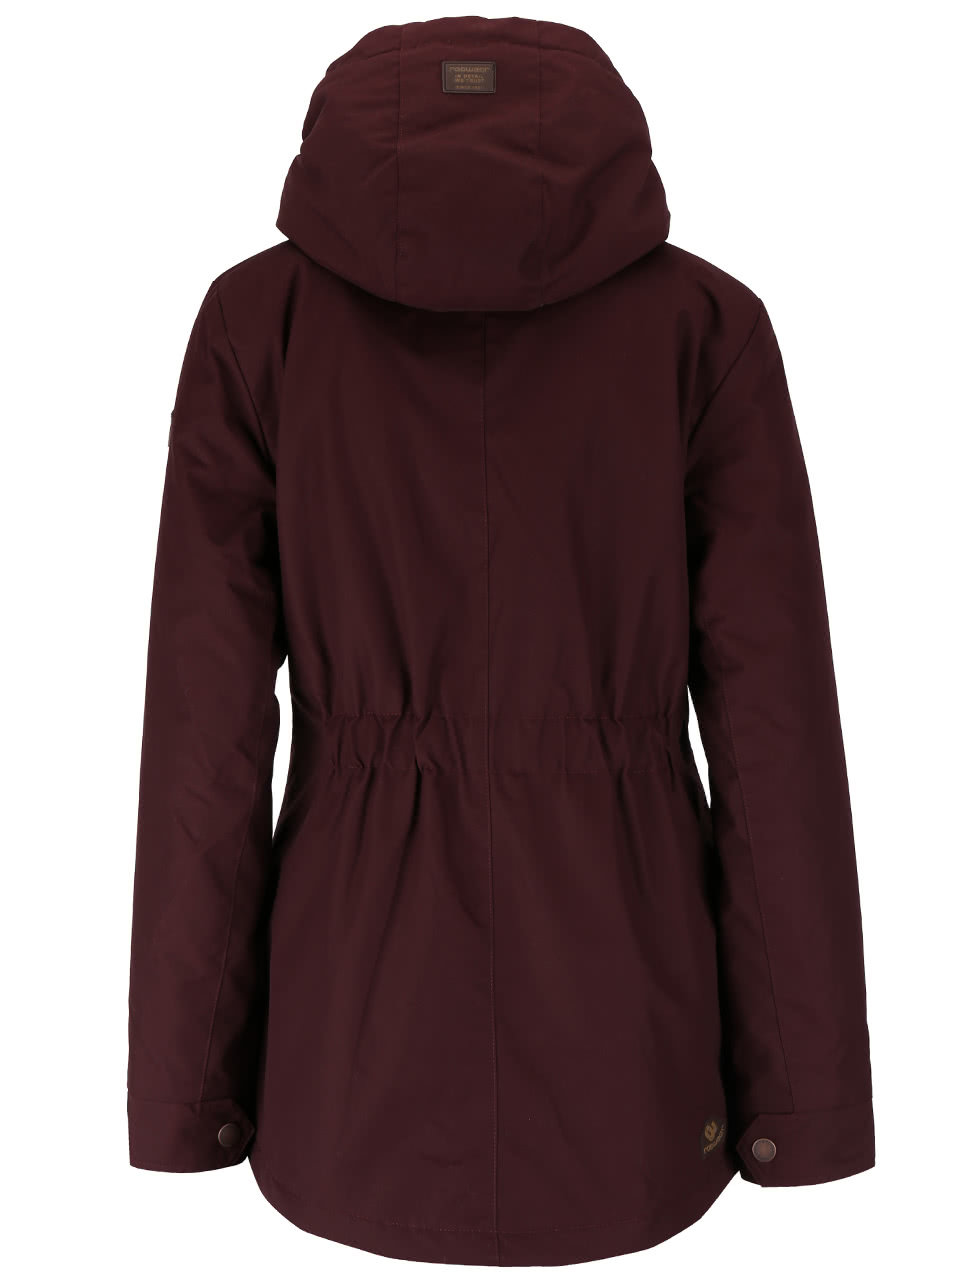 4c9aca0fc761 Vínová dámska bunda s kapucňou Ragwear Monade ...